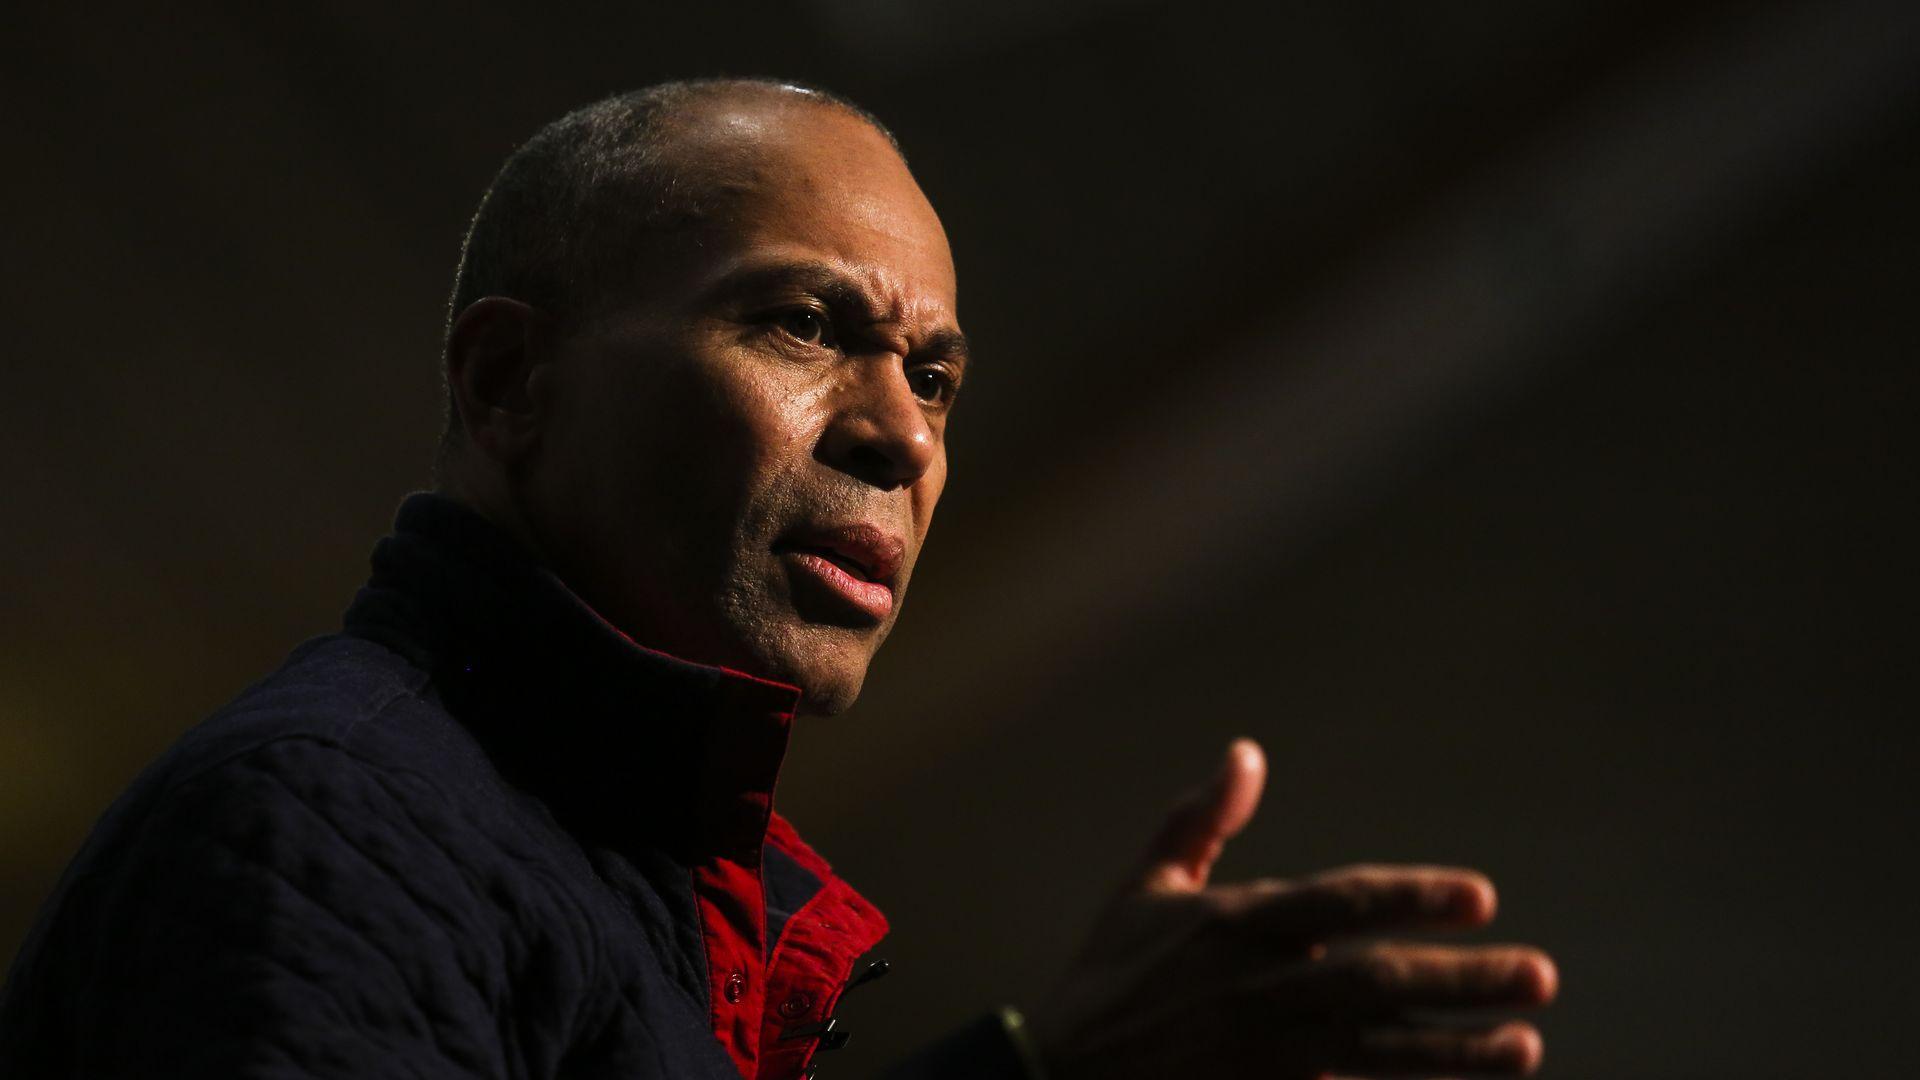 Deval Patrick support reparations as he releases black economic agenda